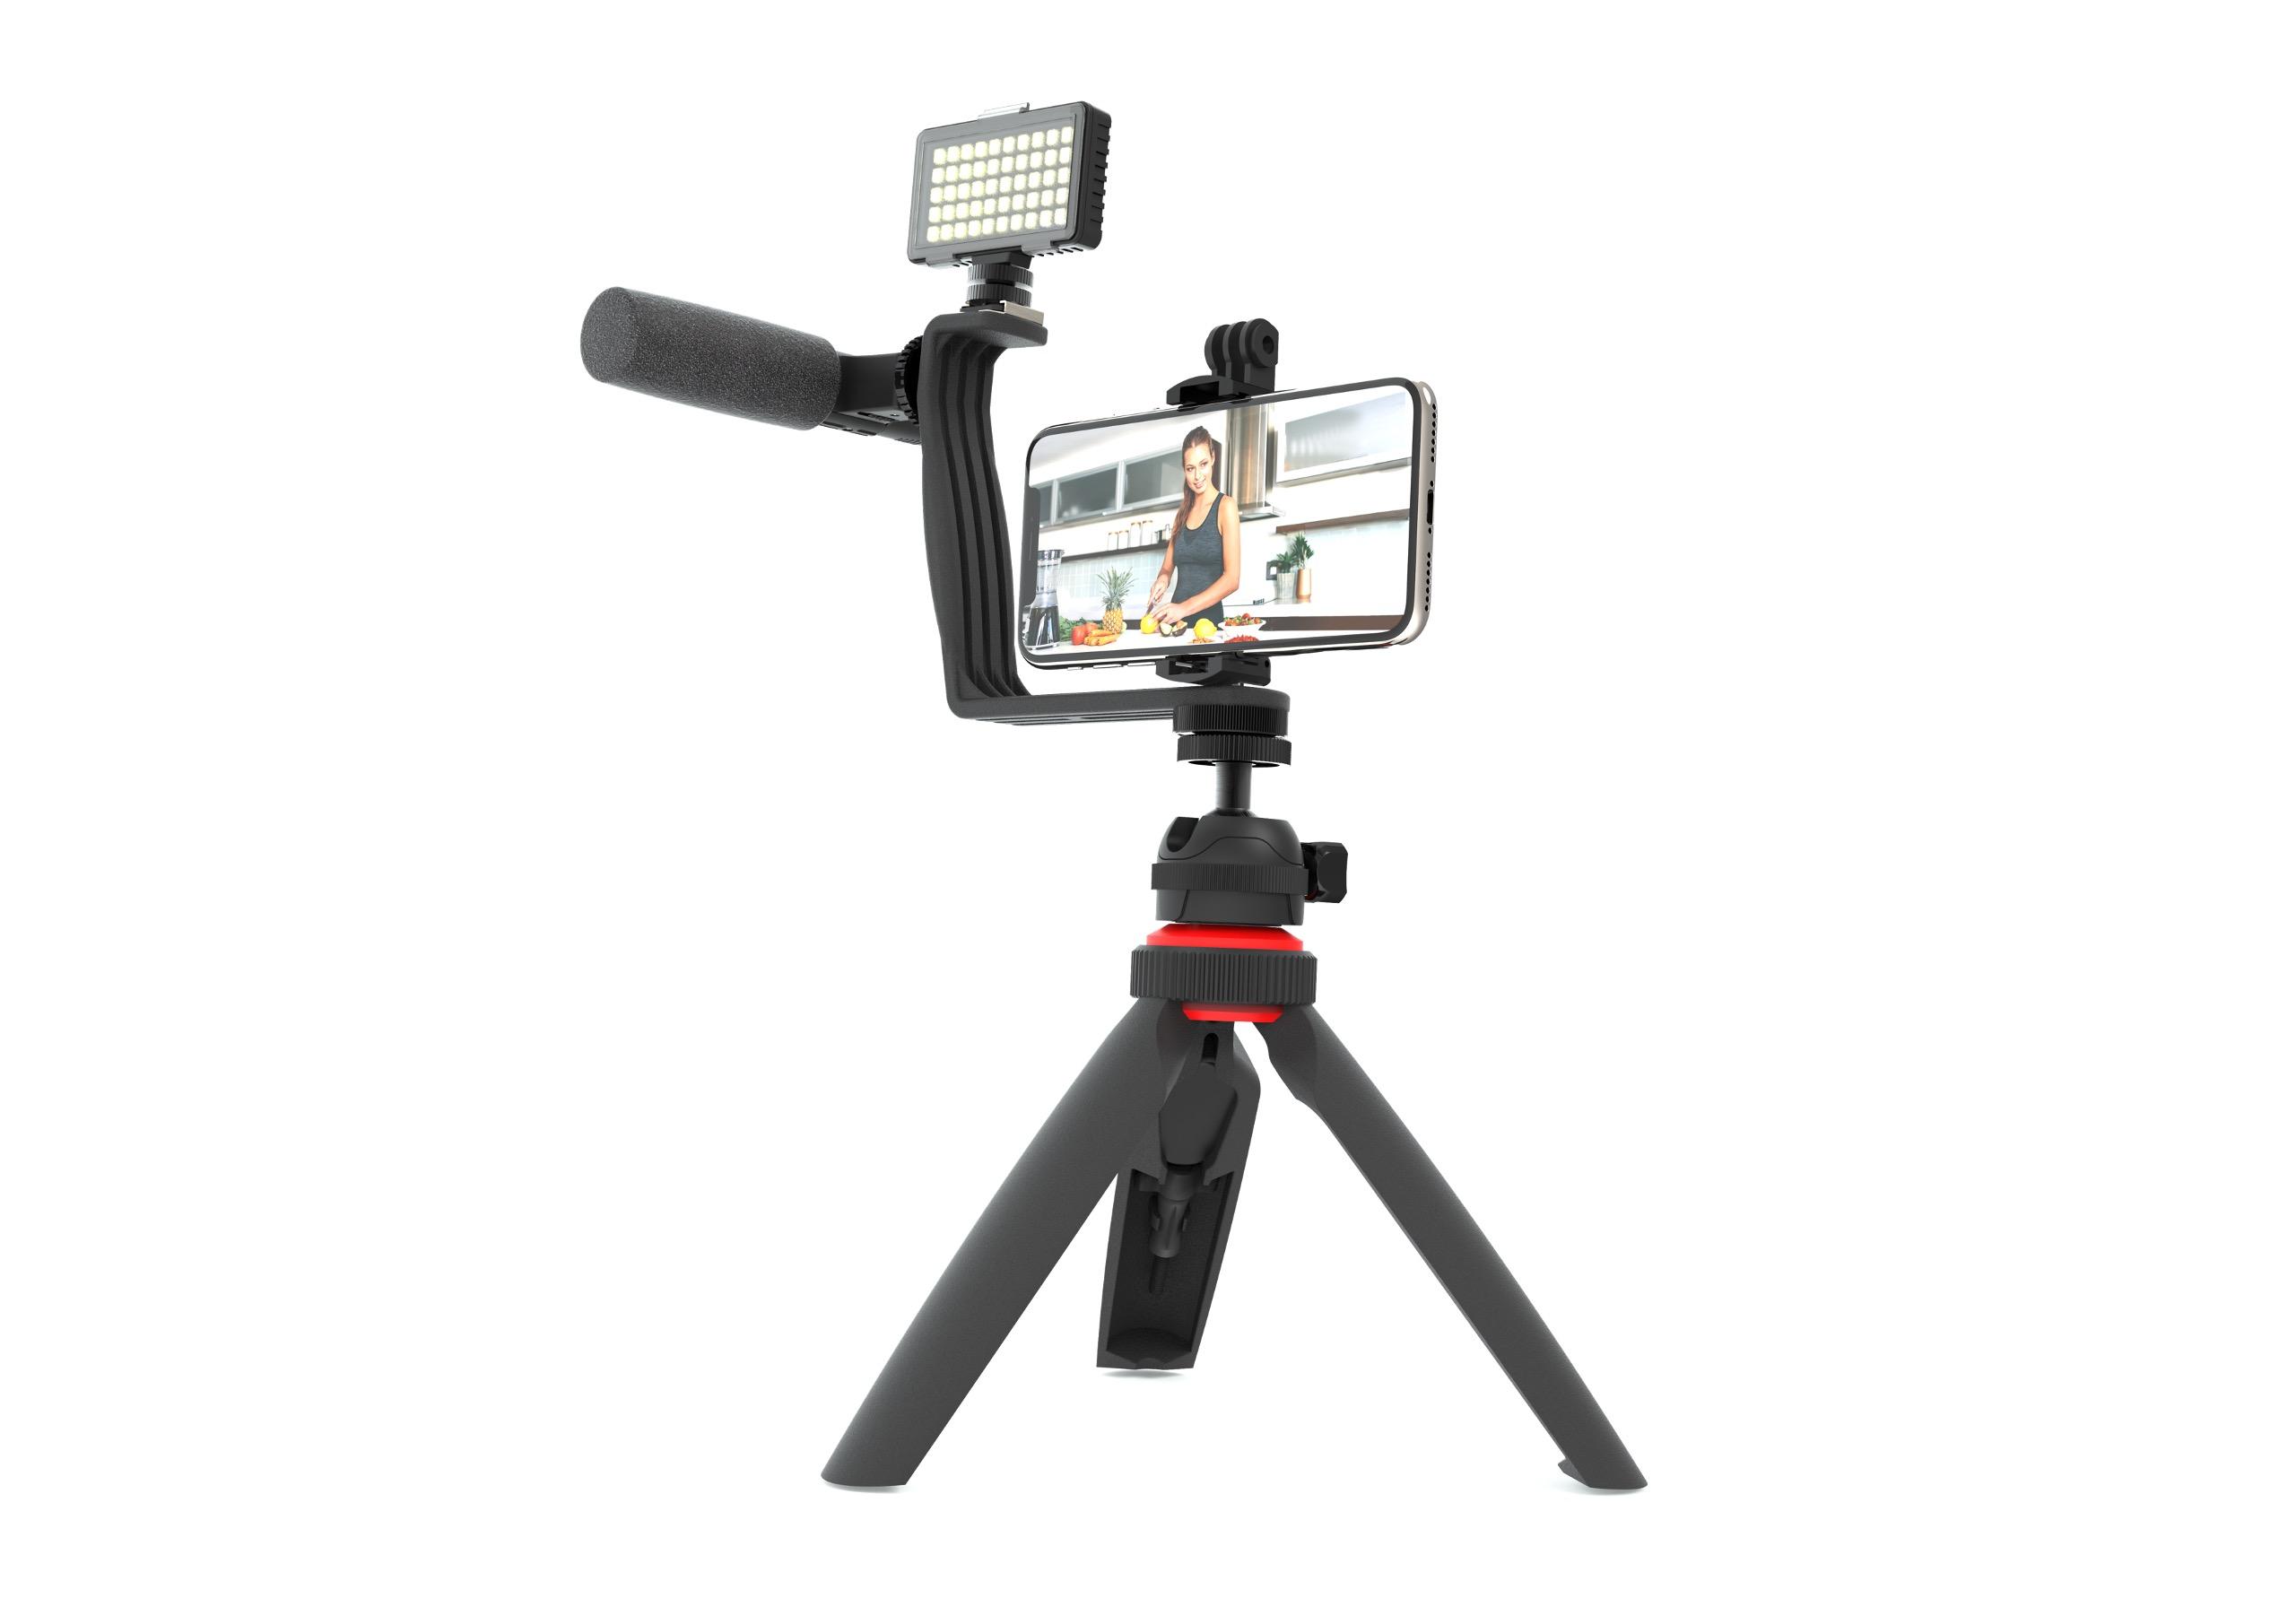 Essential Vlogging Kit Walmart YMMV $2.50